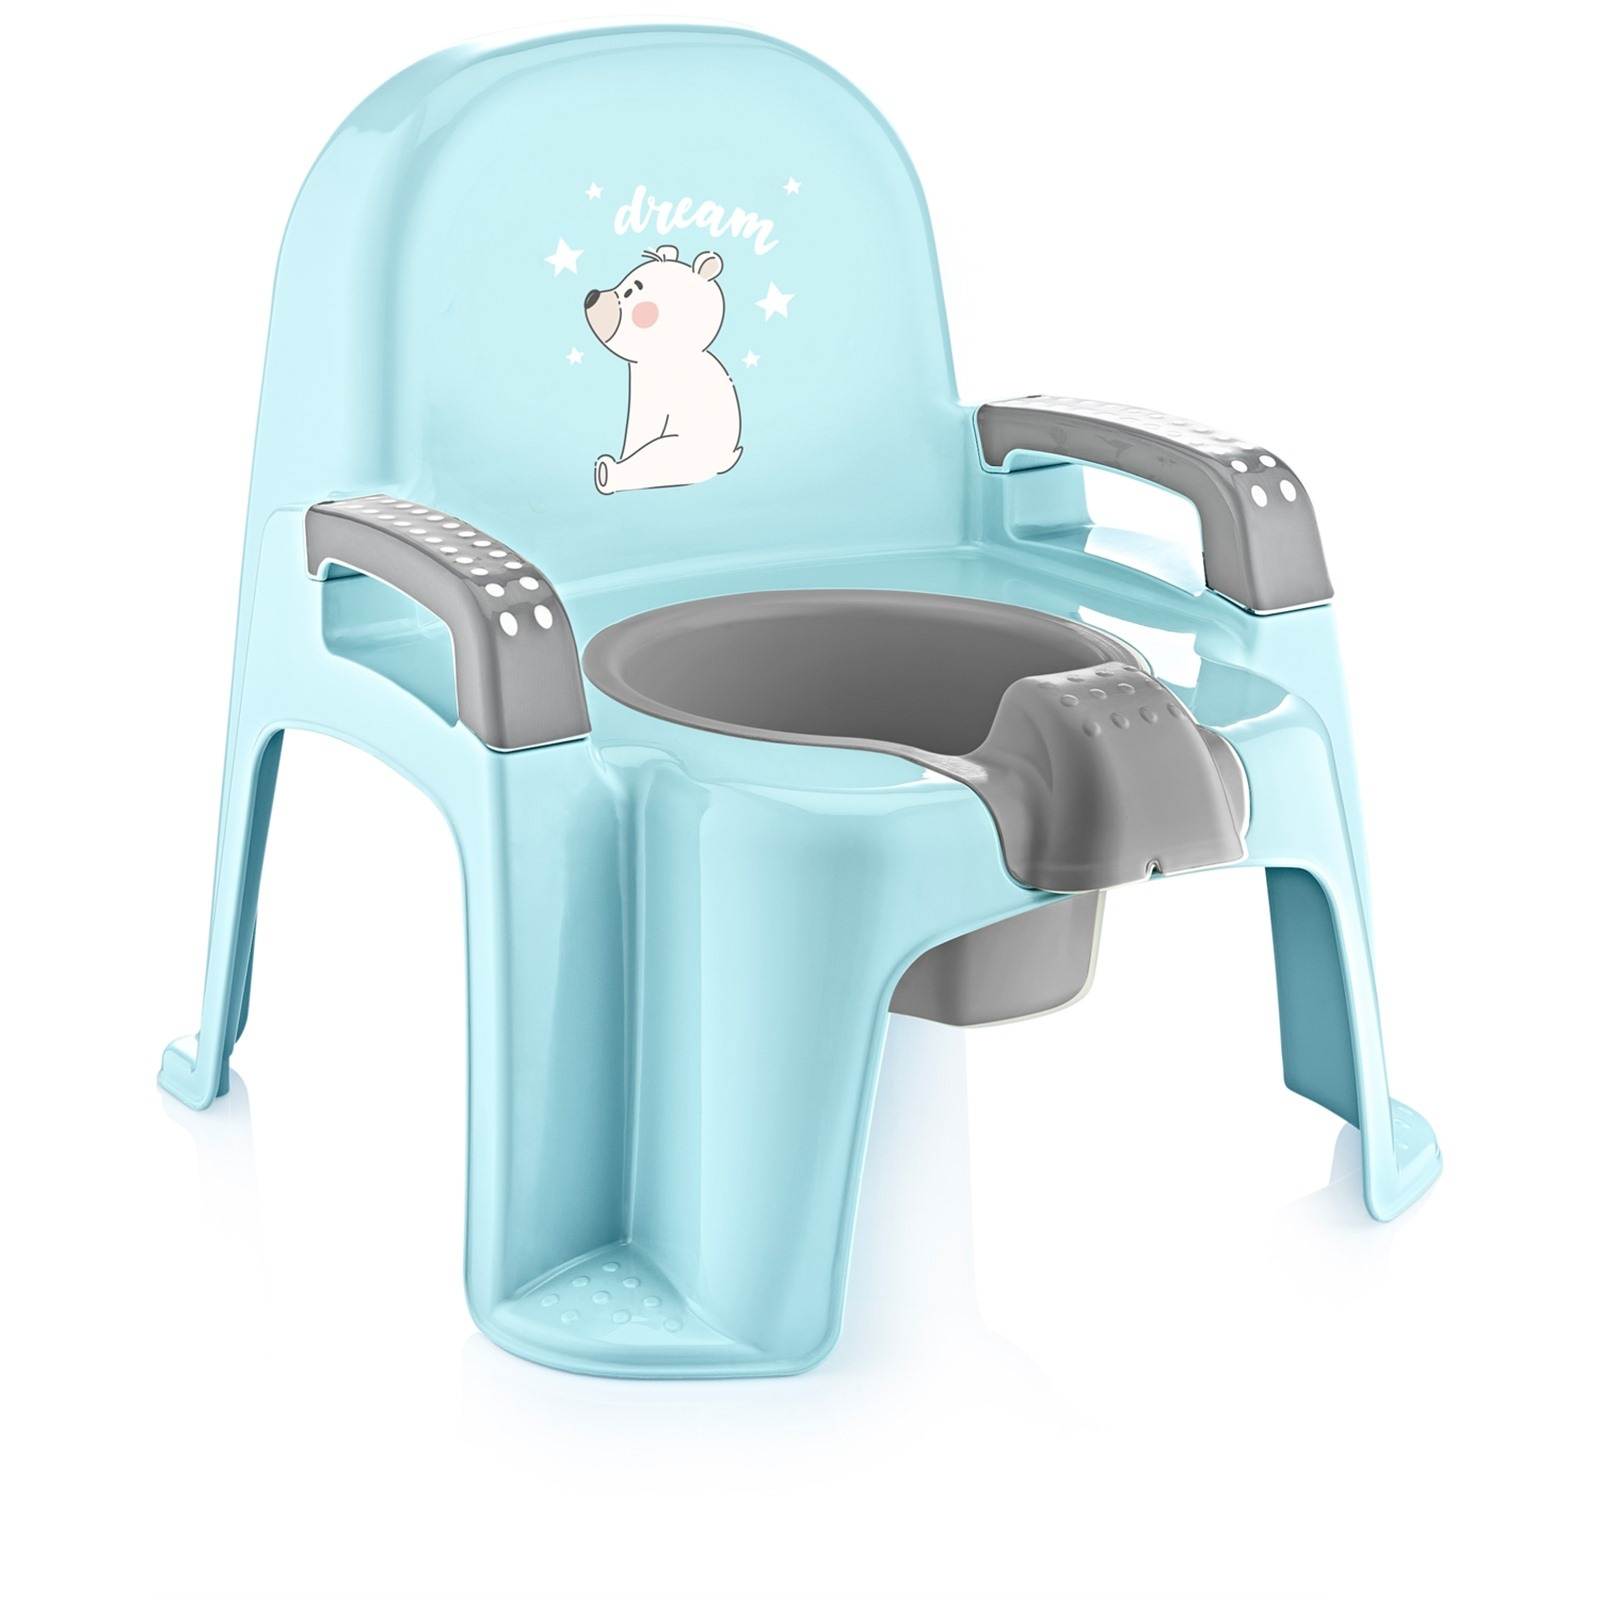 Ebebek Babyjem Flaky Training Practical Baby Seat Potty Children's Pot Baby Potty Toilet Urinal For Boys Kids Toilet Seat